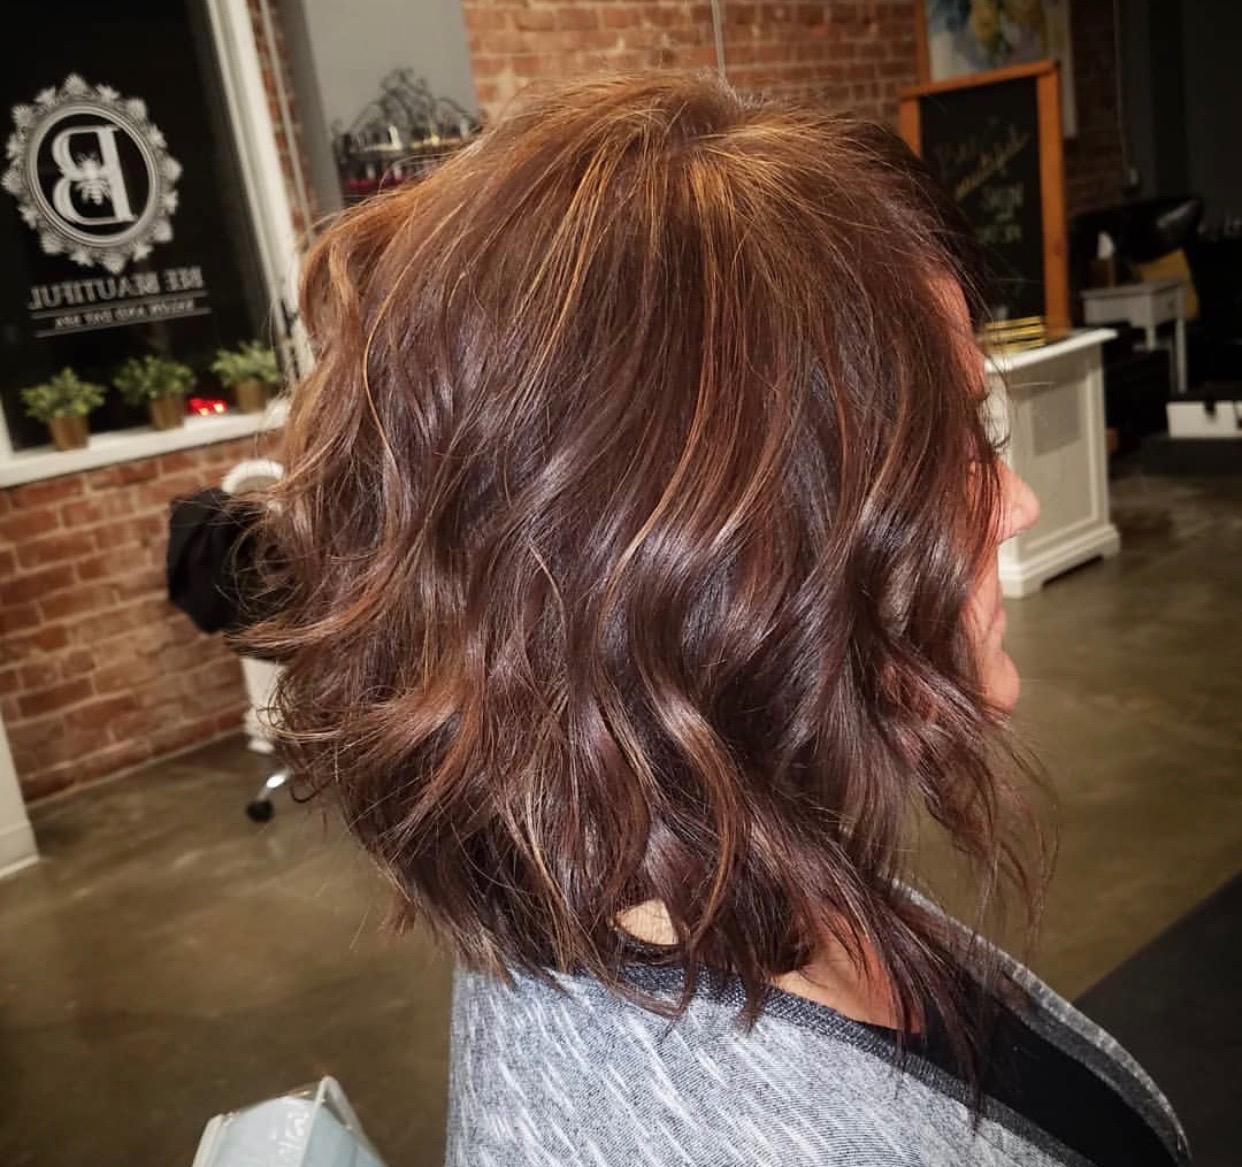 Hair by Teri Borba